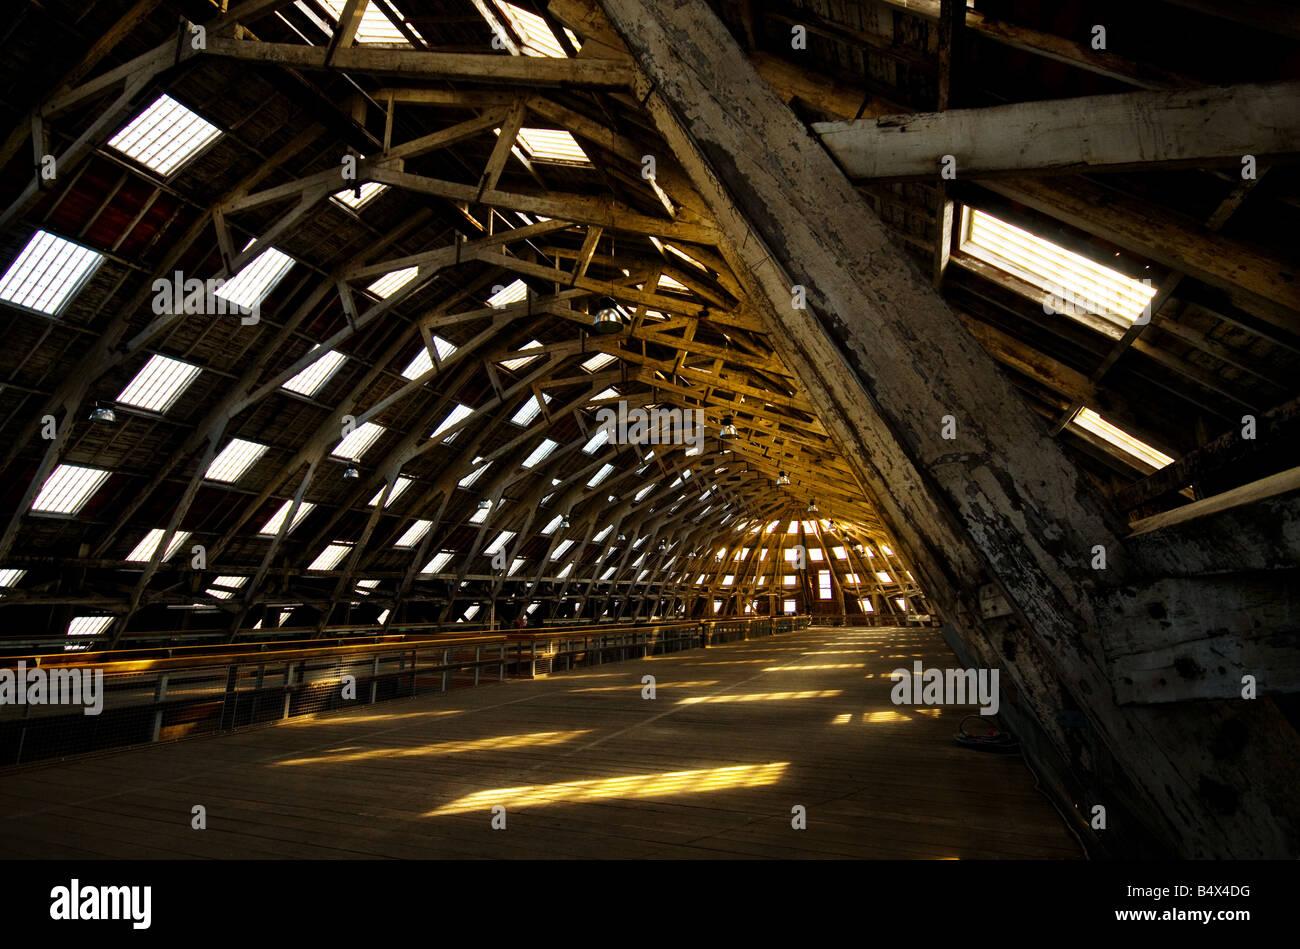 No 3 Slip Cover Chatham Historic Dockyard in Kent. Stock Photo